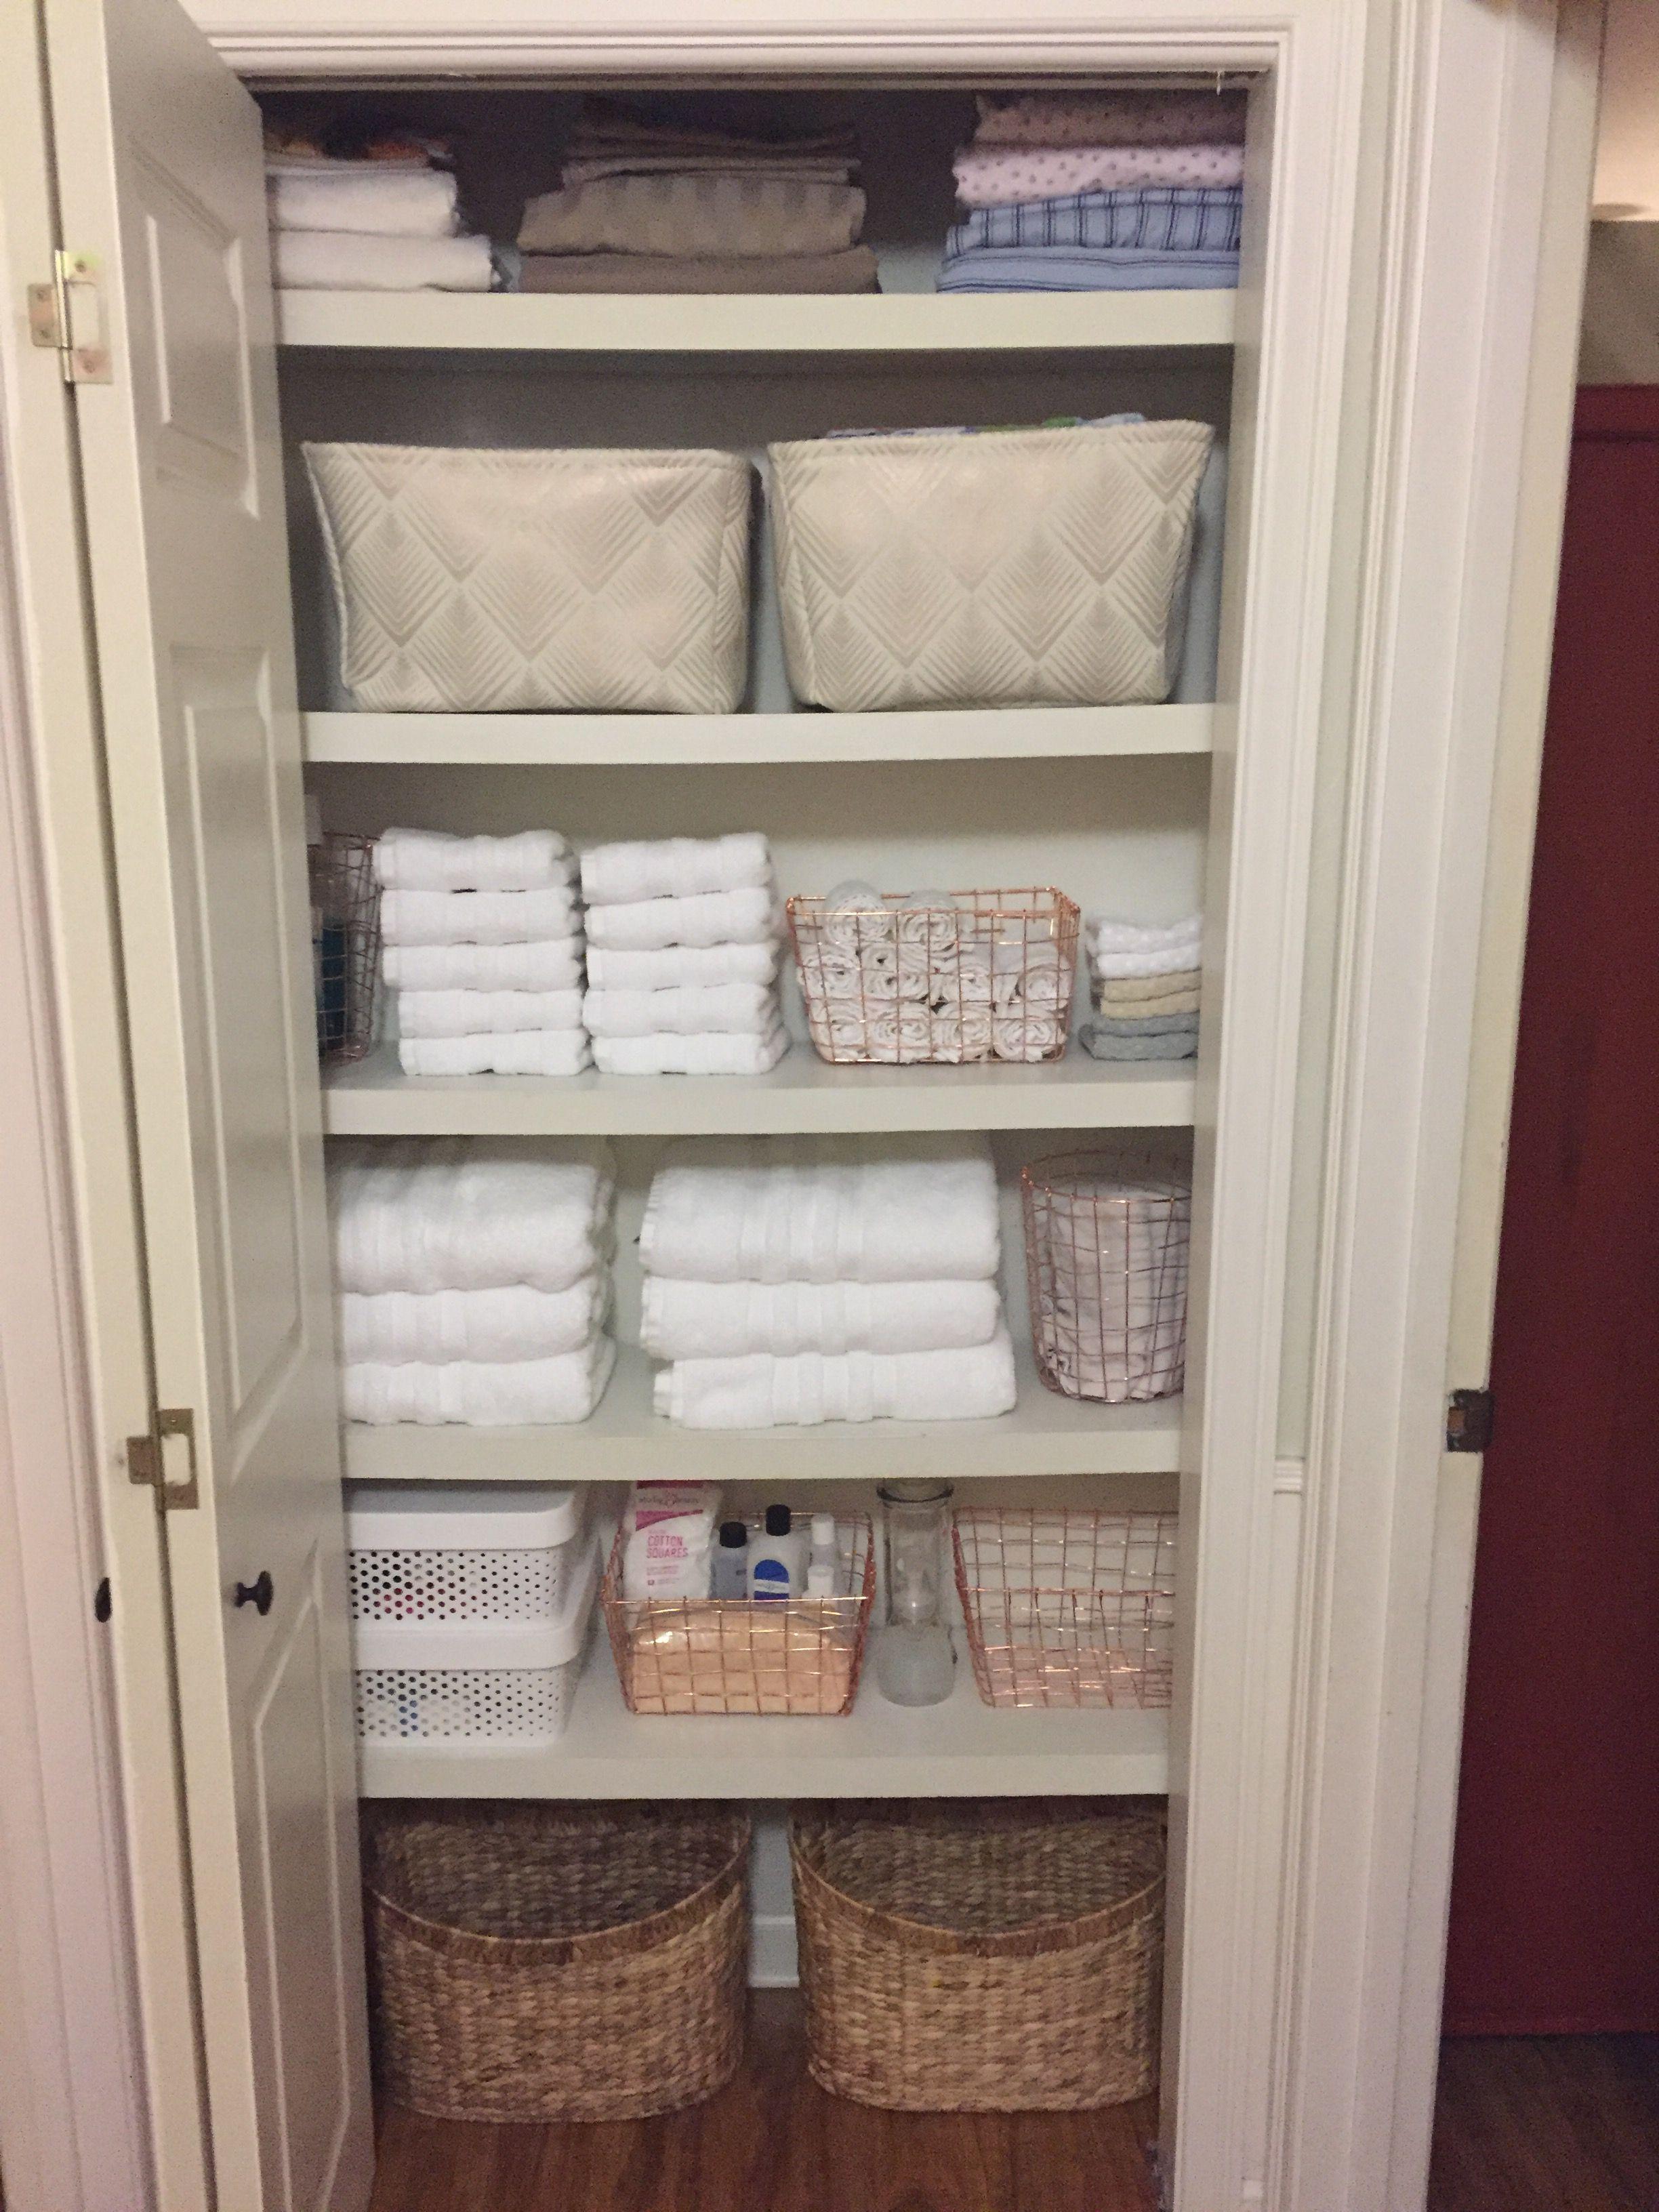 Pin By Kem Mcguire On Organize Me In 2020 Linen Closet Organization Organizing Linens Bathroom Closet Organization